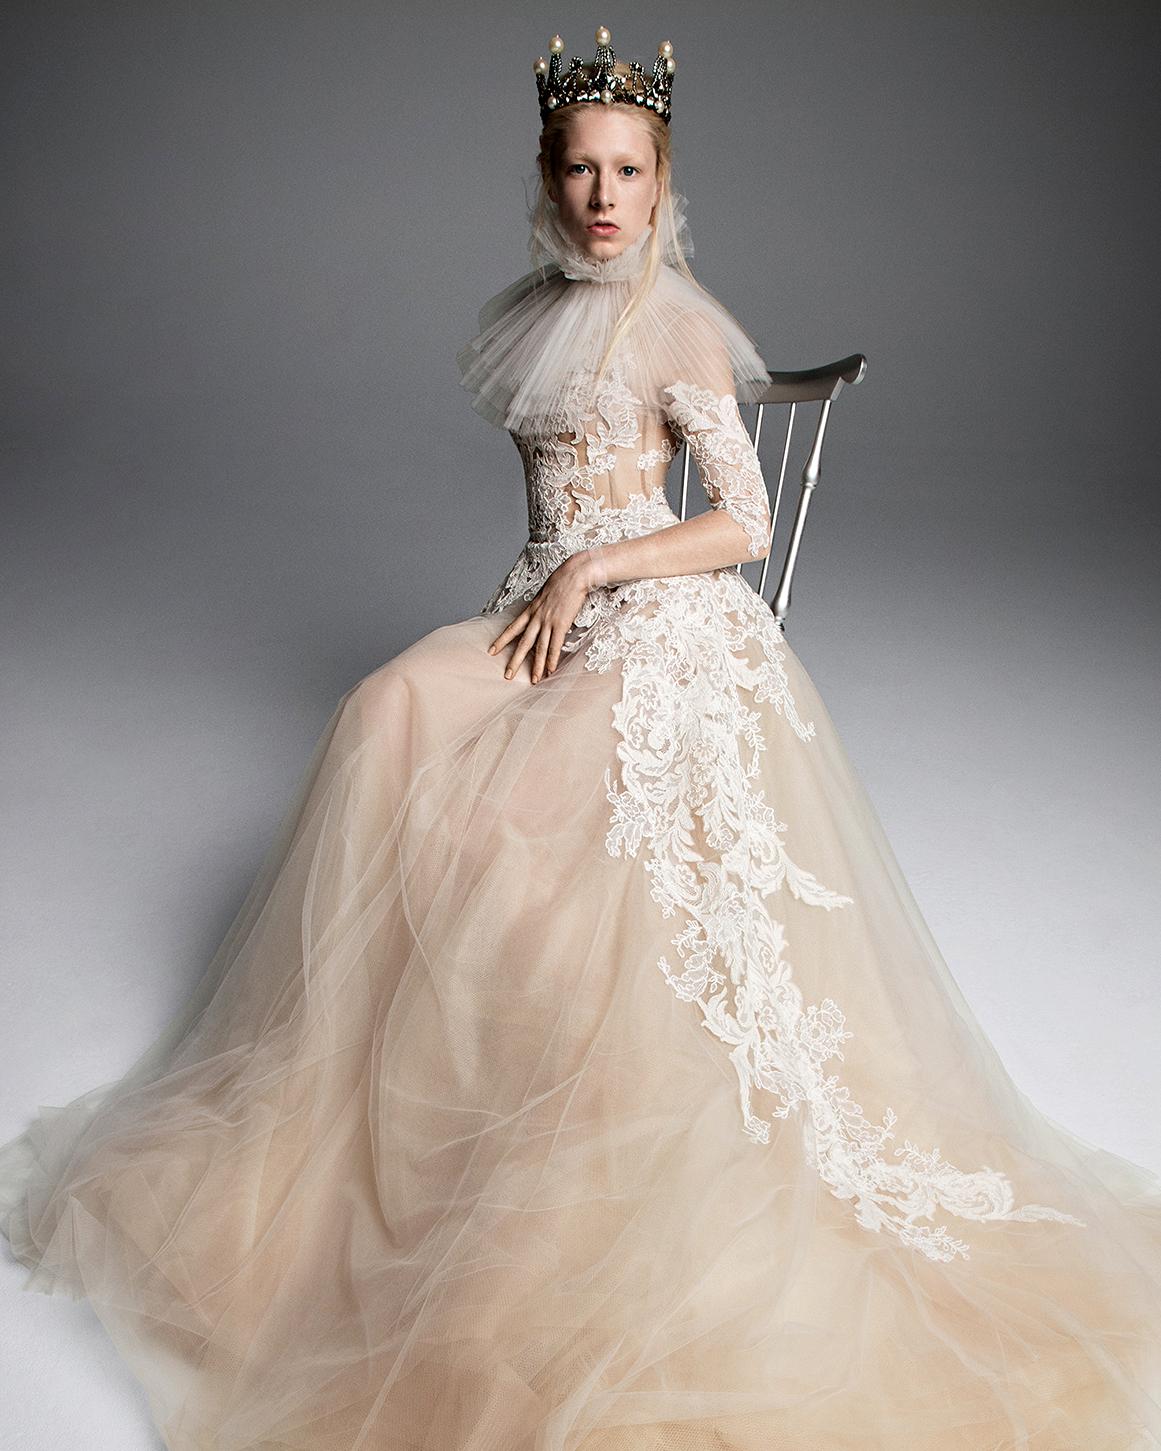 vera wang wedding dress champagne ball gown asymmetric lace detail